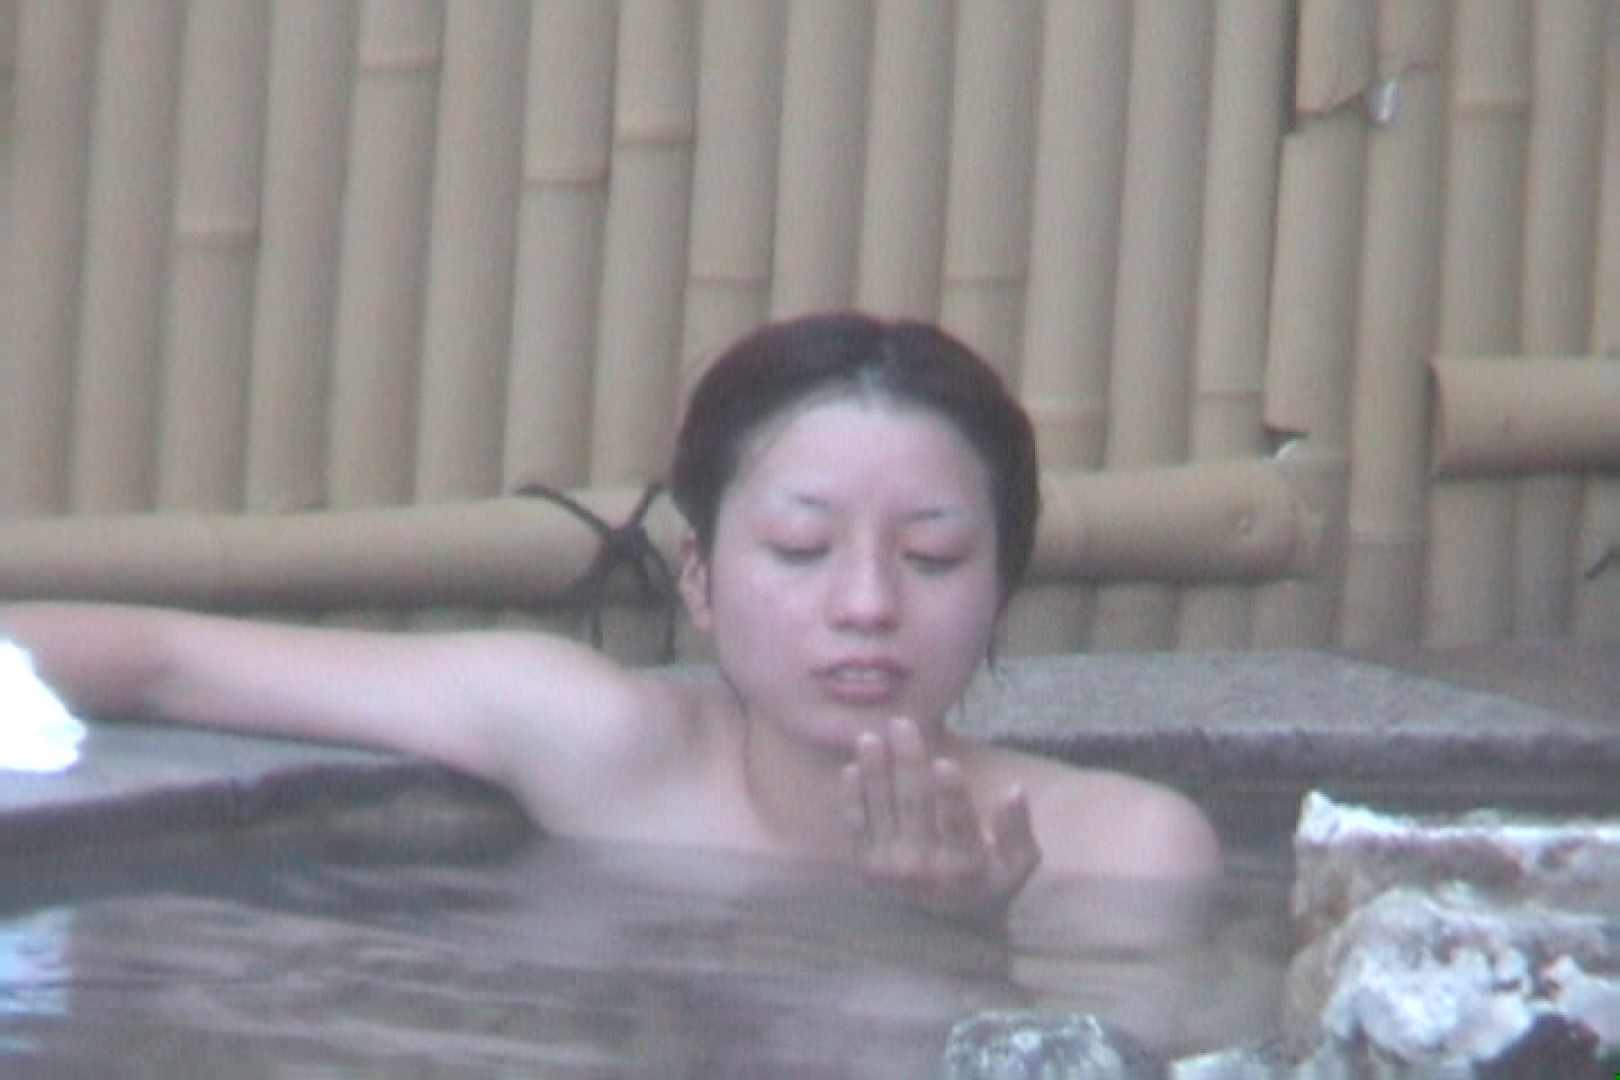 Aquaな露天風呂Vol.608 盗撮 戯れ無修正画像 69連発 56